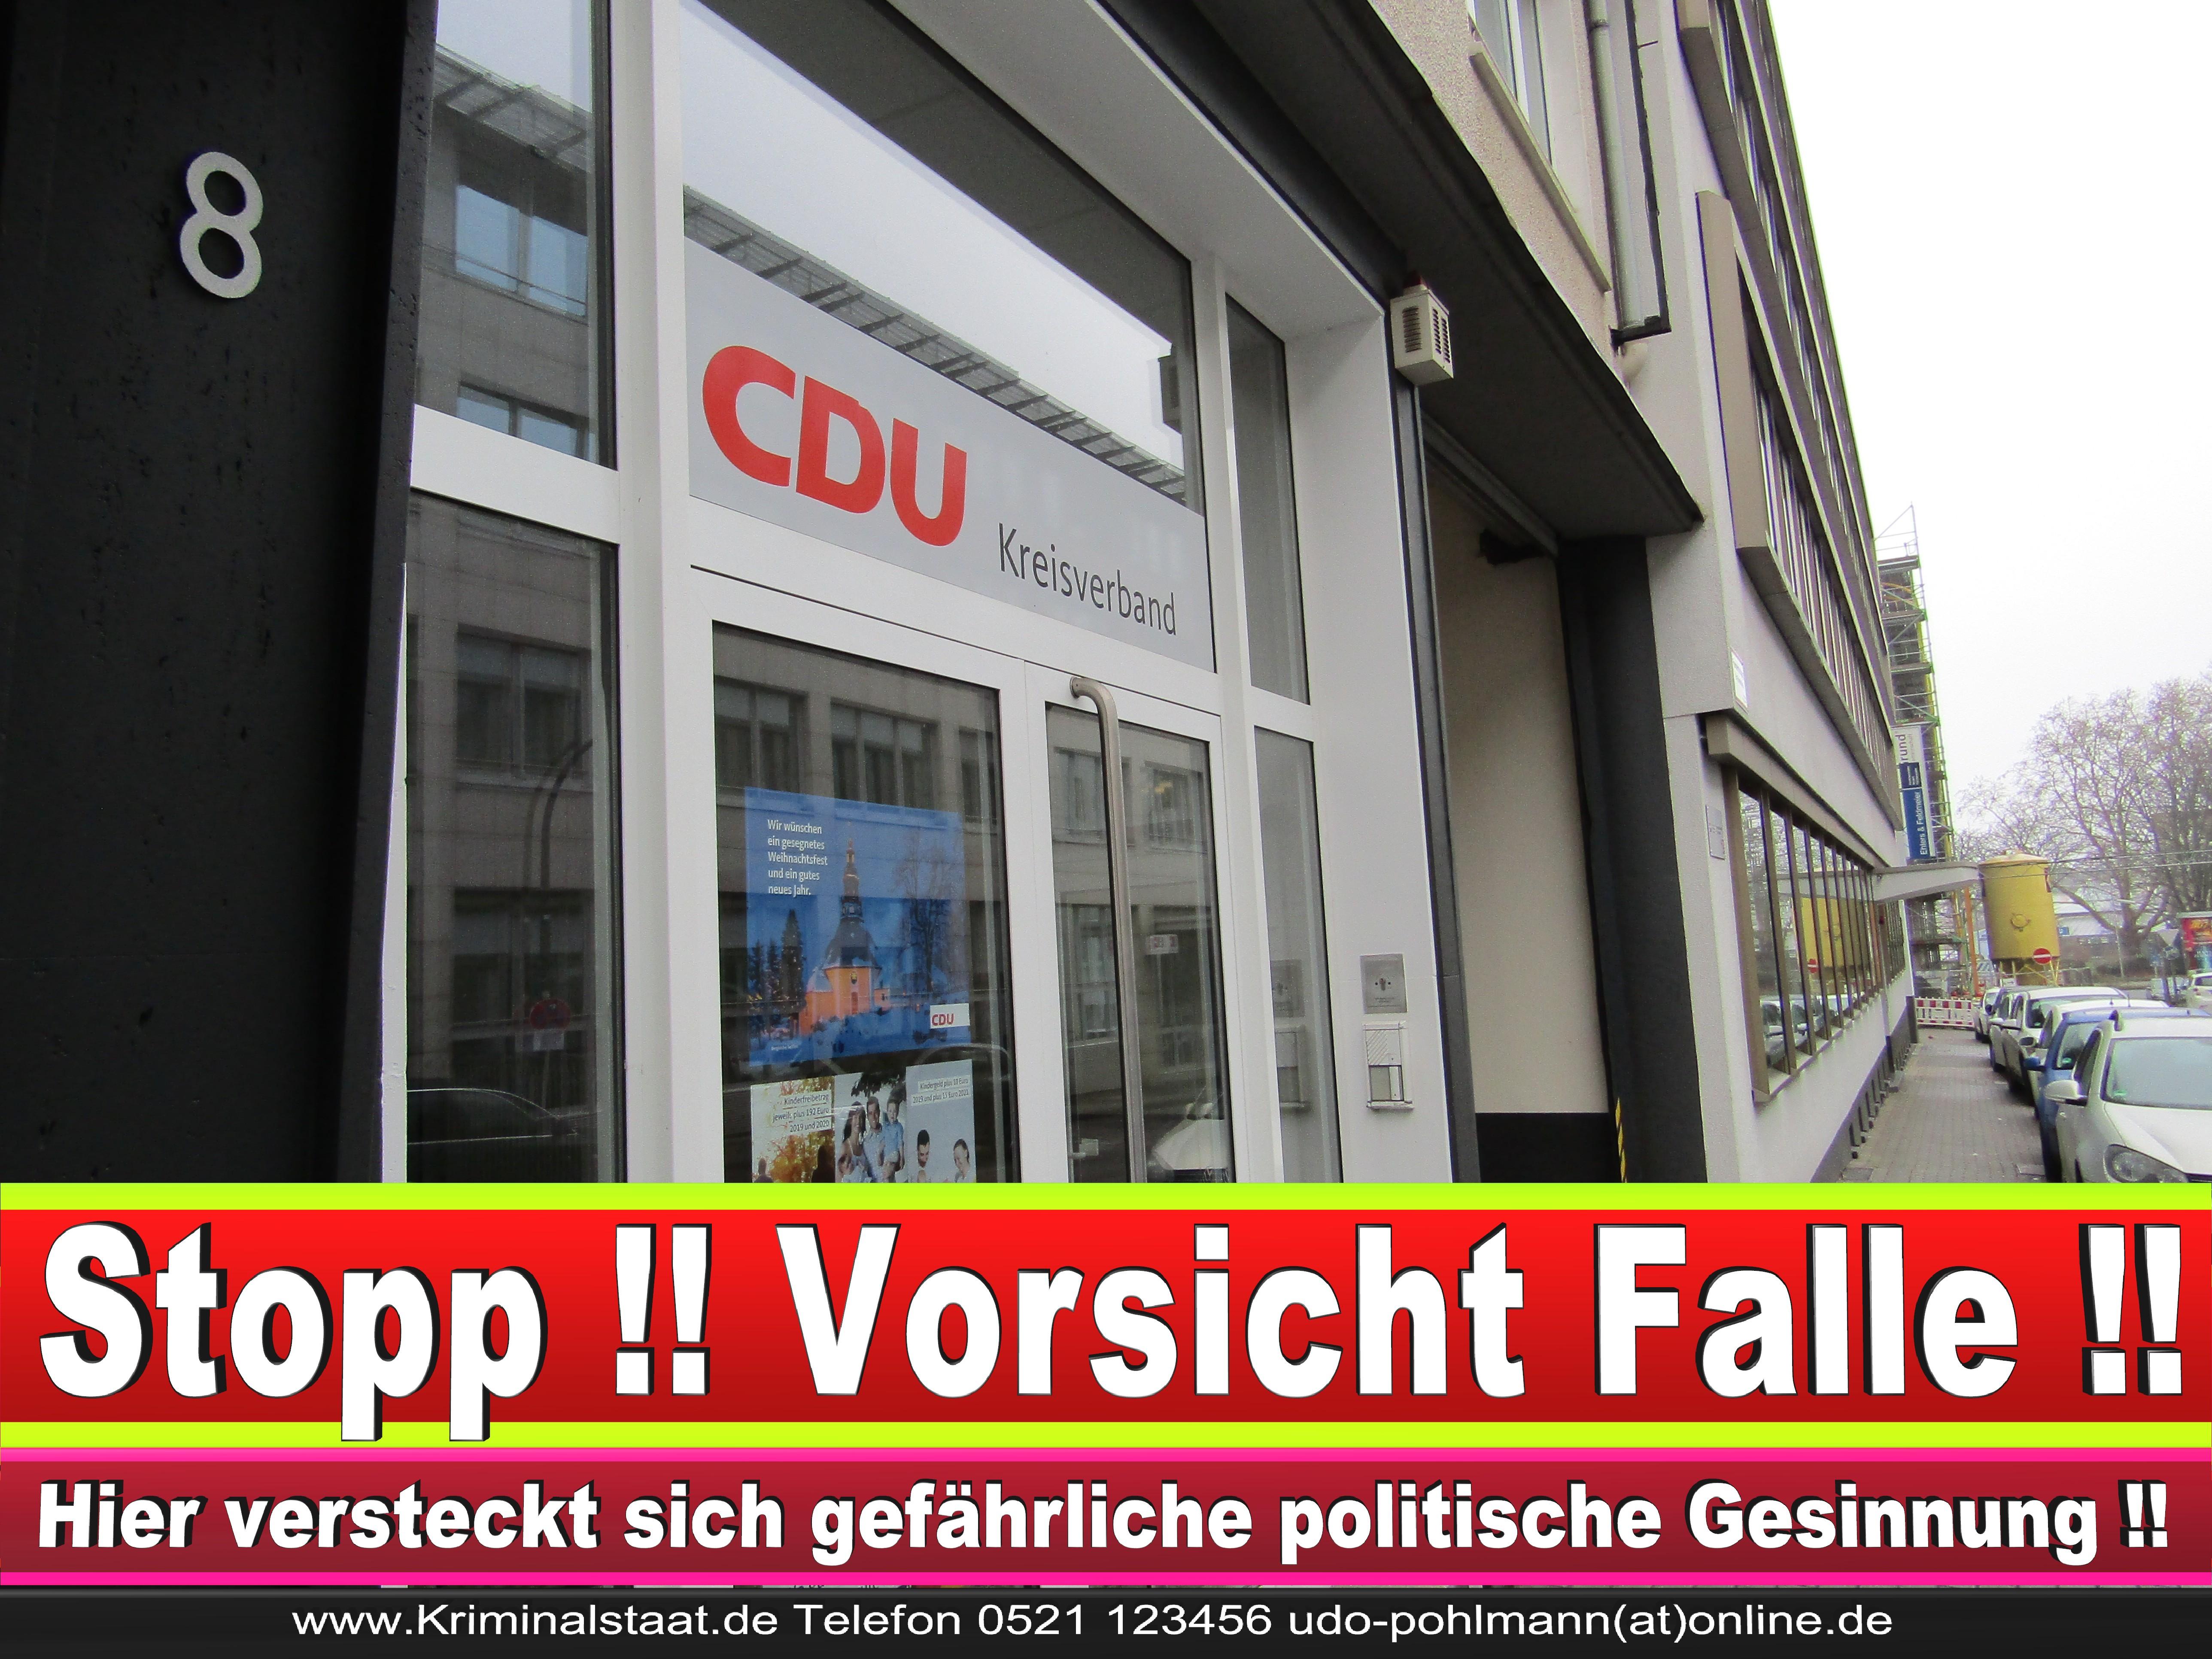 CDU DORTMUND KREISVERBAND BüRGERBüRO CDU FRAKTION ORTSVERBAND CDU NRW GESCHäFTSSTELLE ADRESSE RATSMITGLIEDER CDU (14) 1